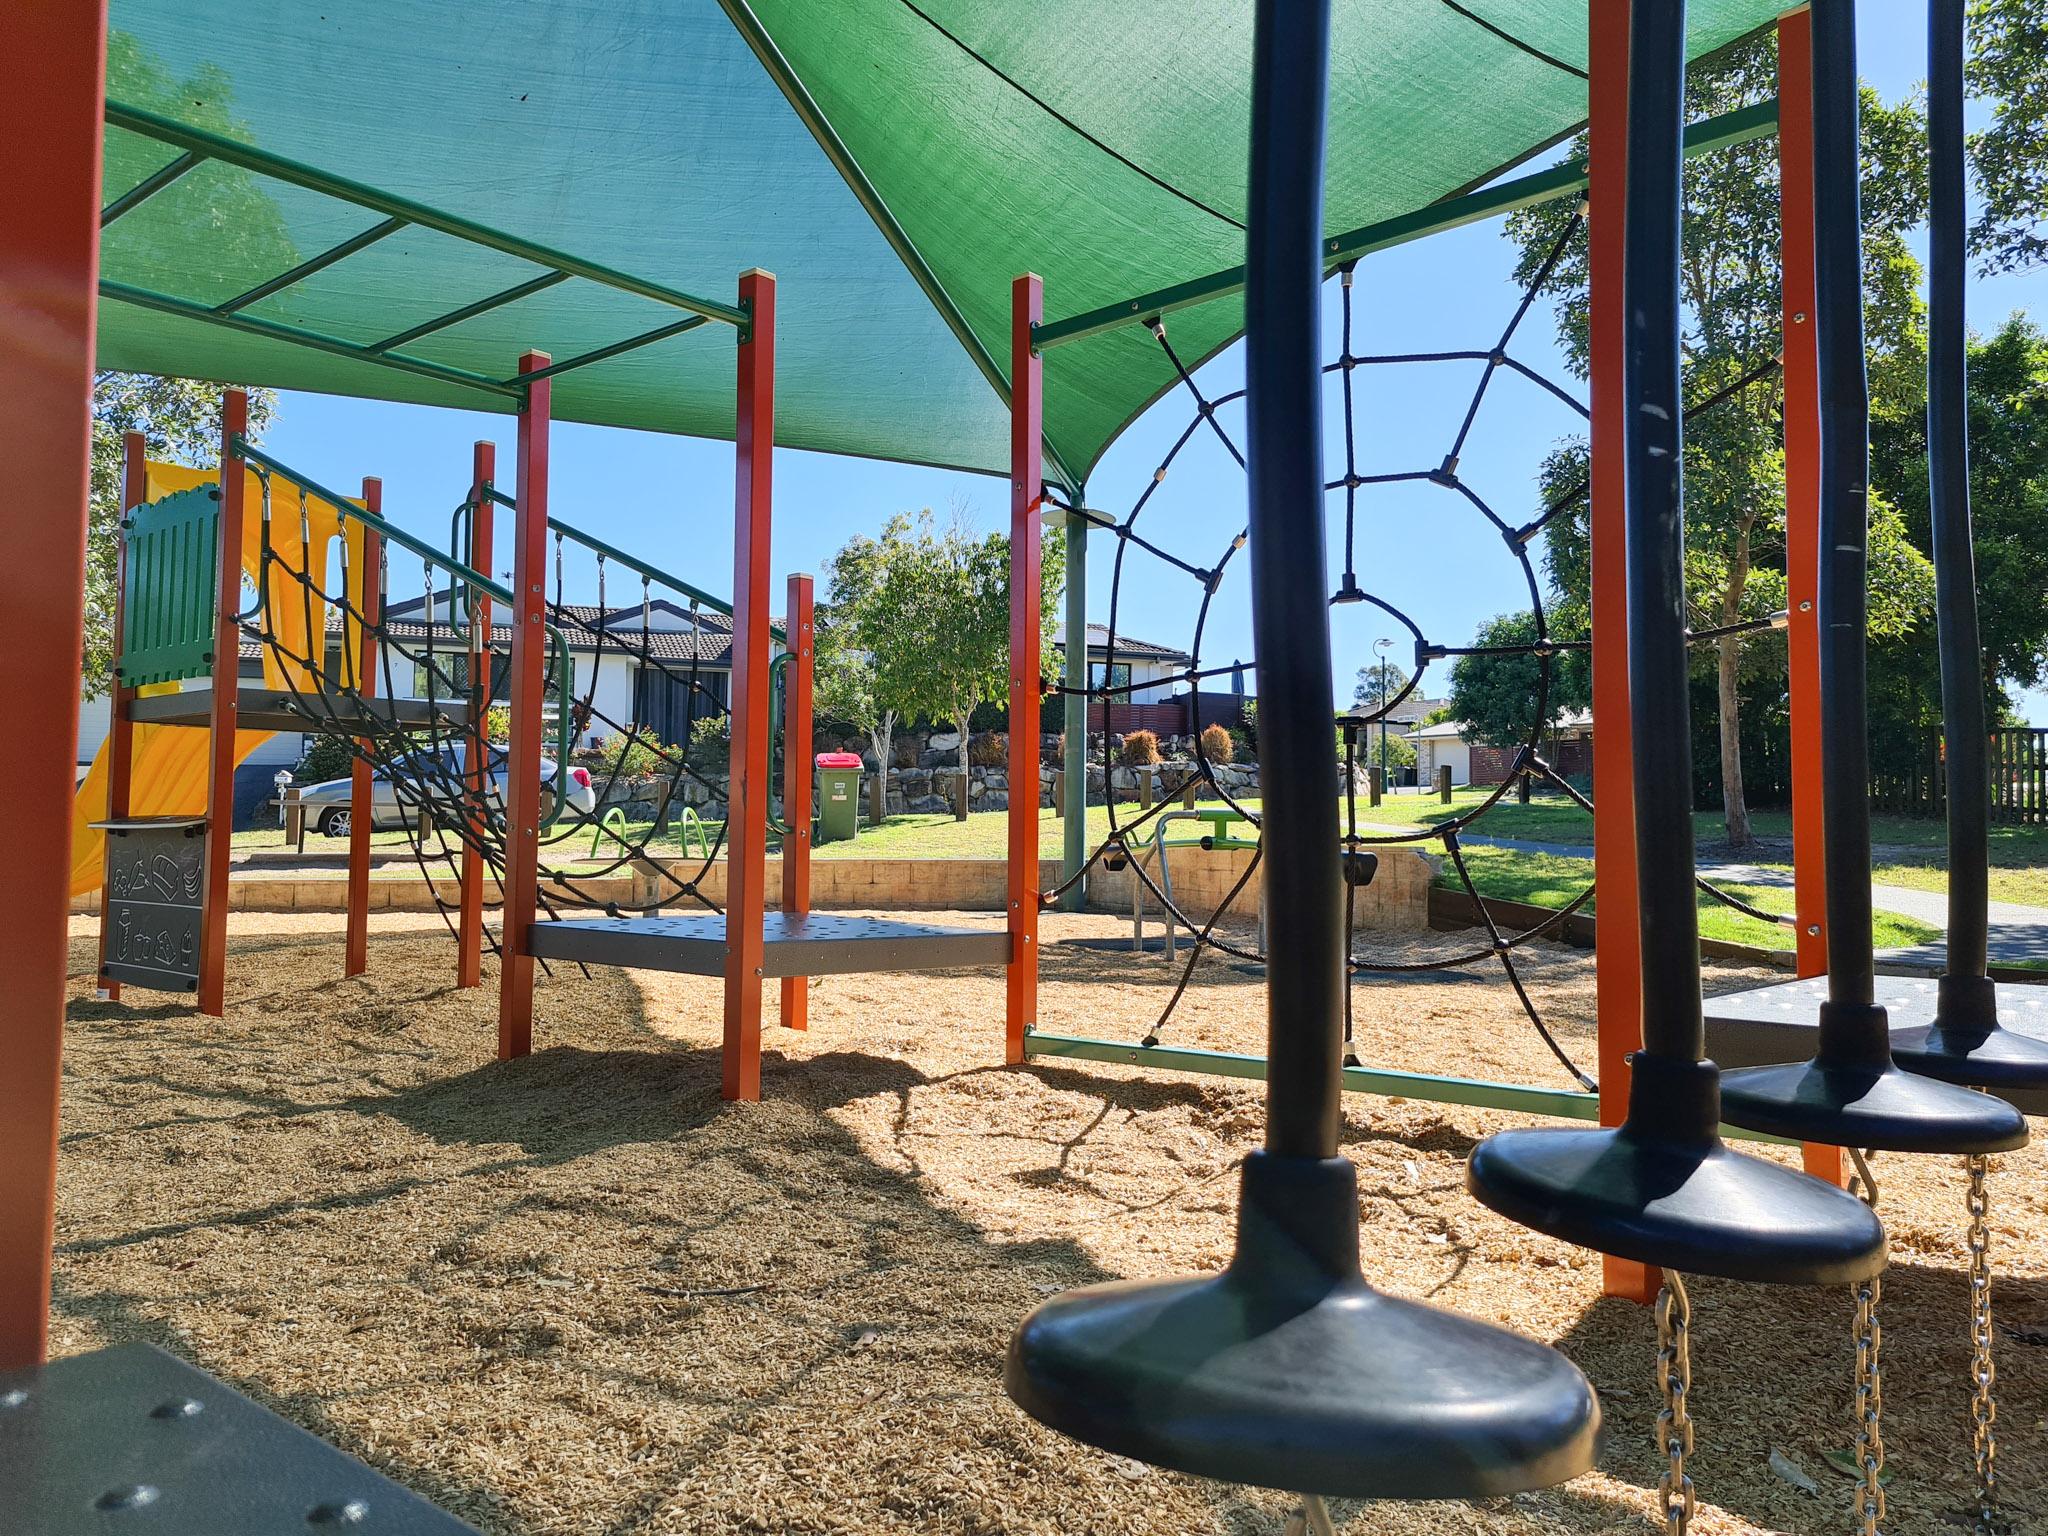 palm-beach-state-school-playrground-austek-play-57